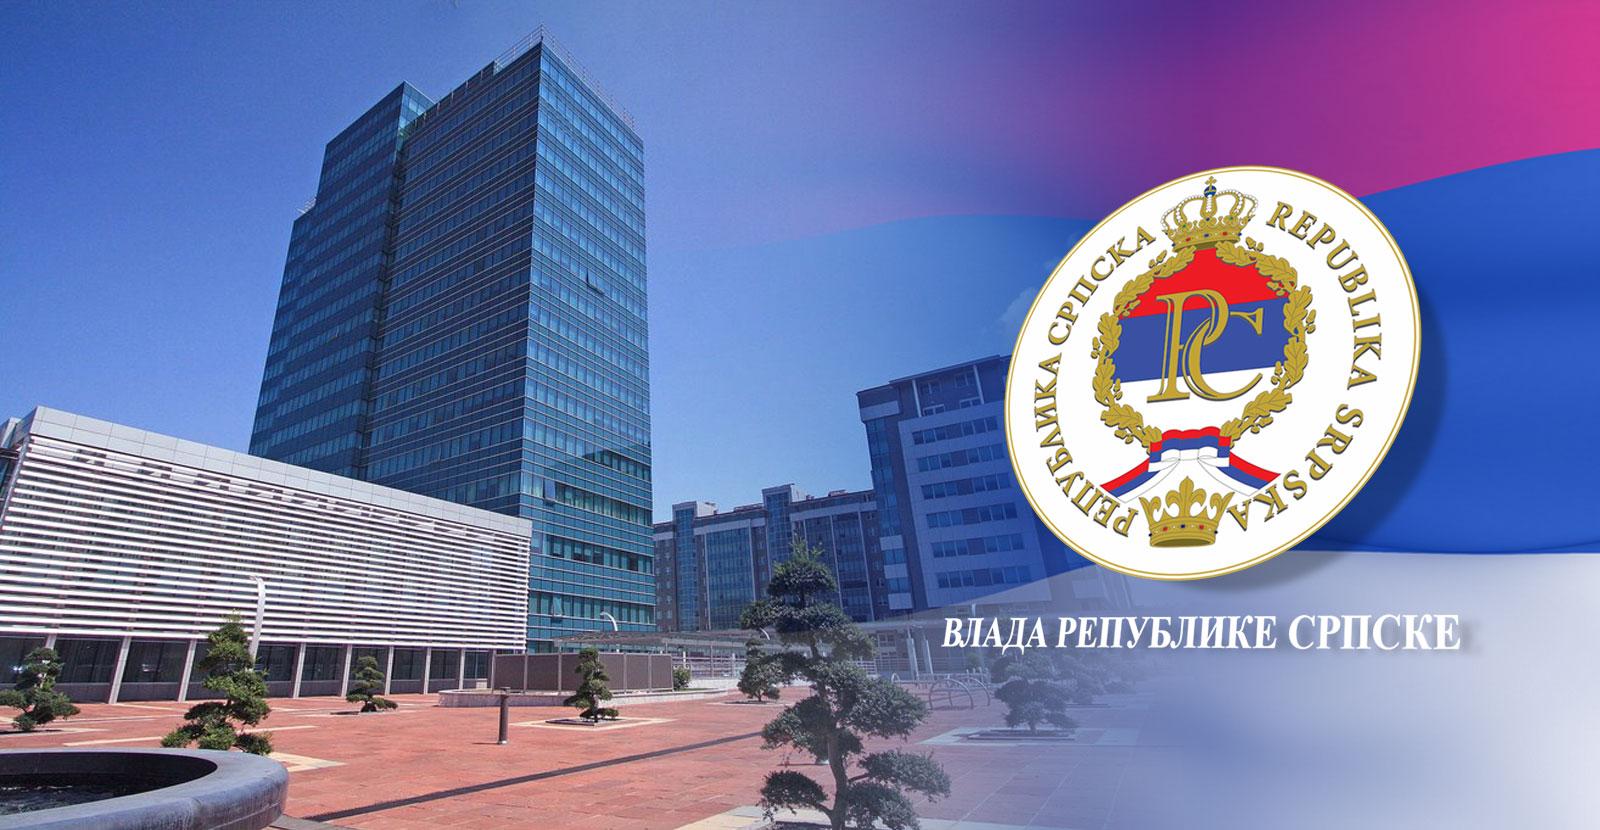 Javne rasprave za Zakon o društvenom preduzetništvu Republike Srpske